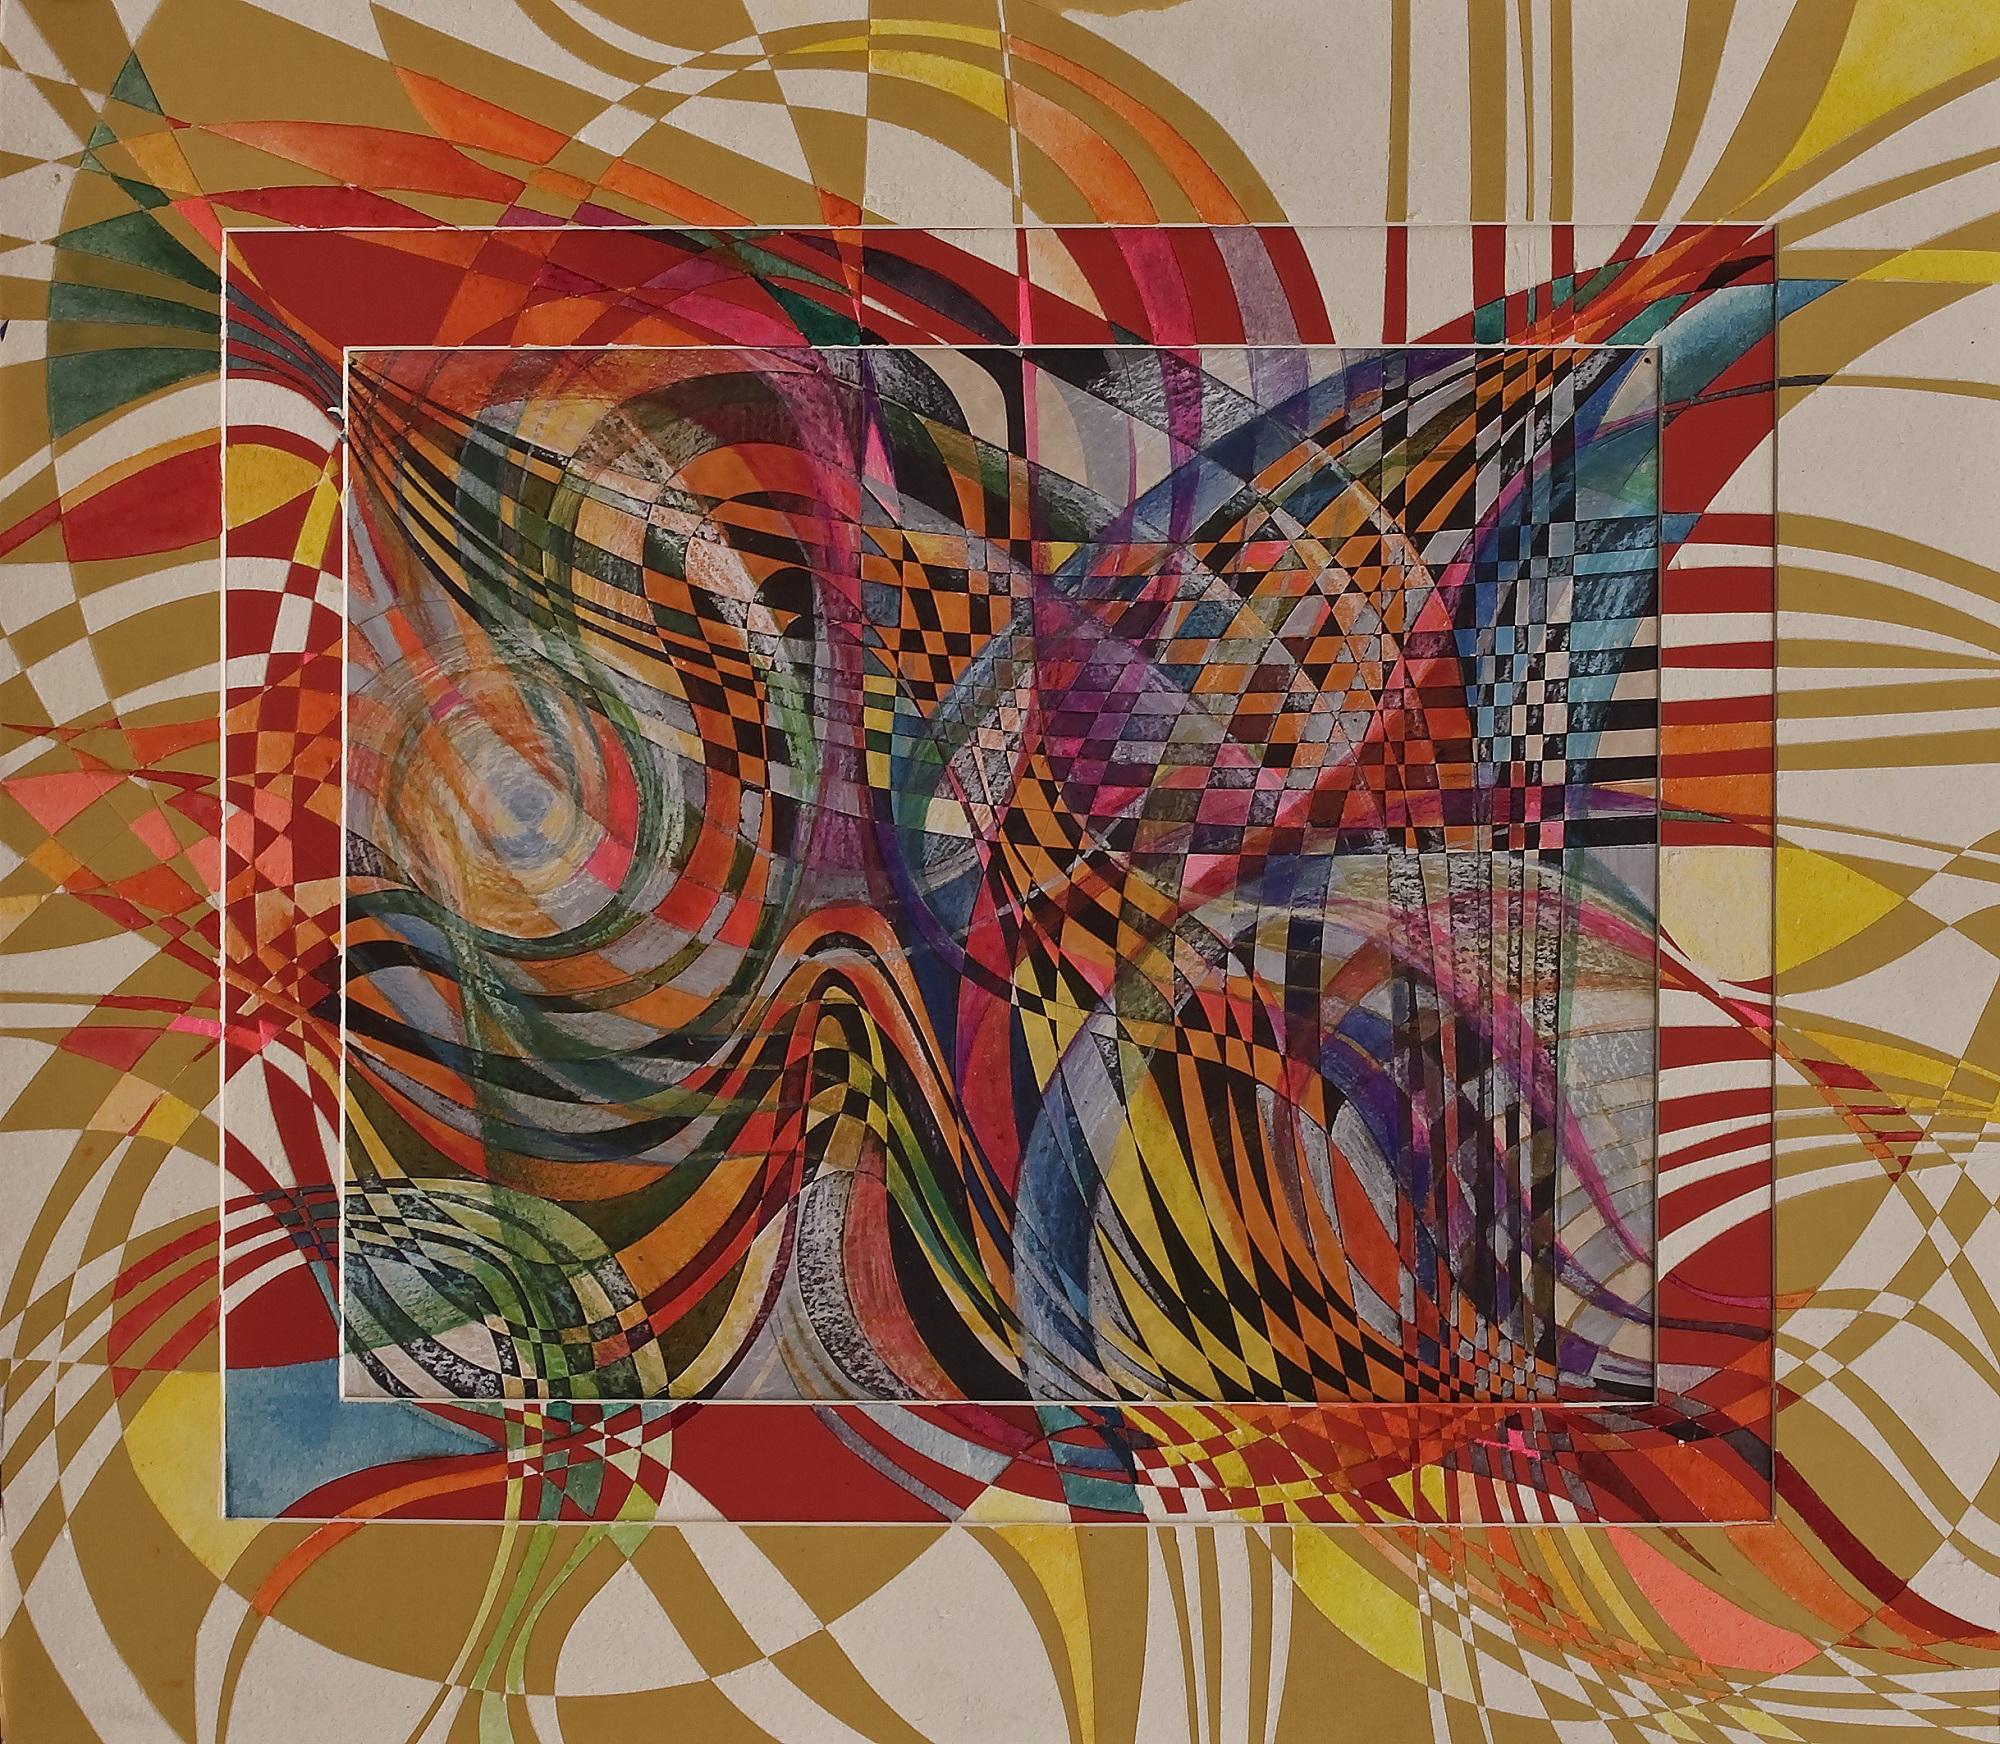 """Butterflies"" Rumyanka Bozhkova Drawing Engraving on Multilayer Cardboard"